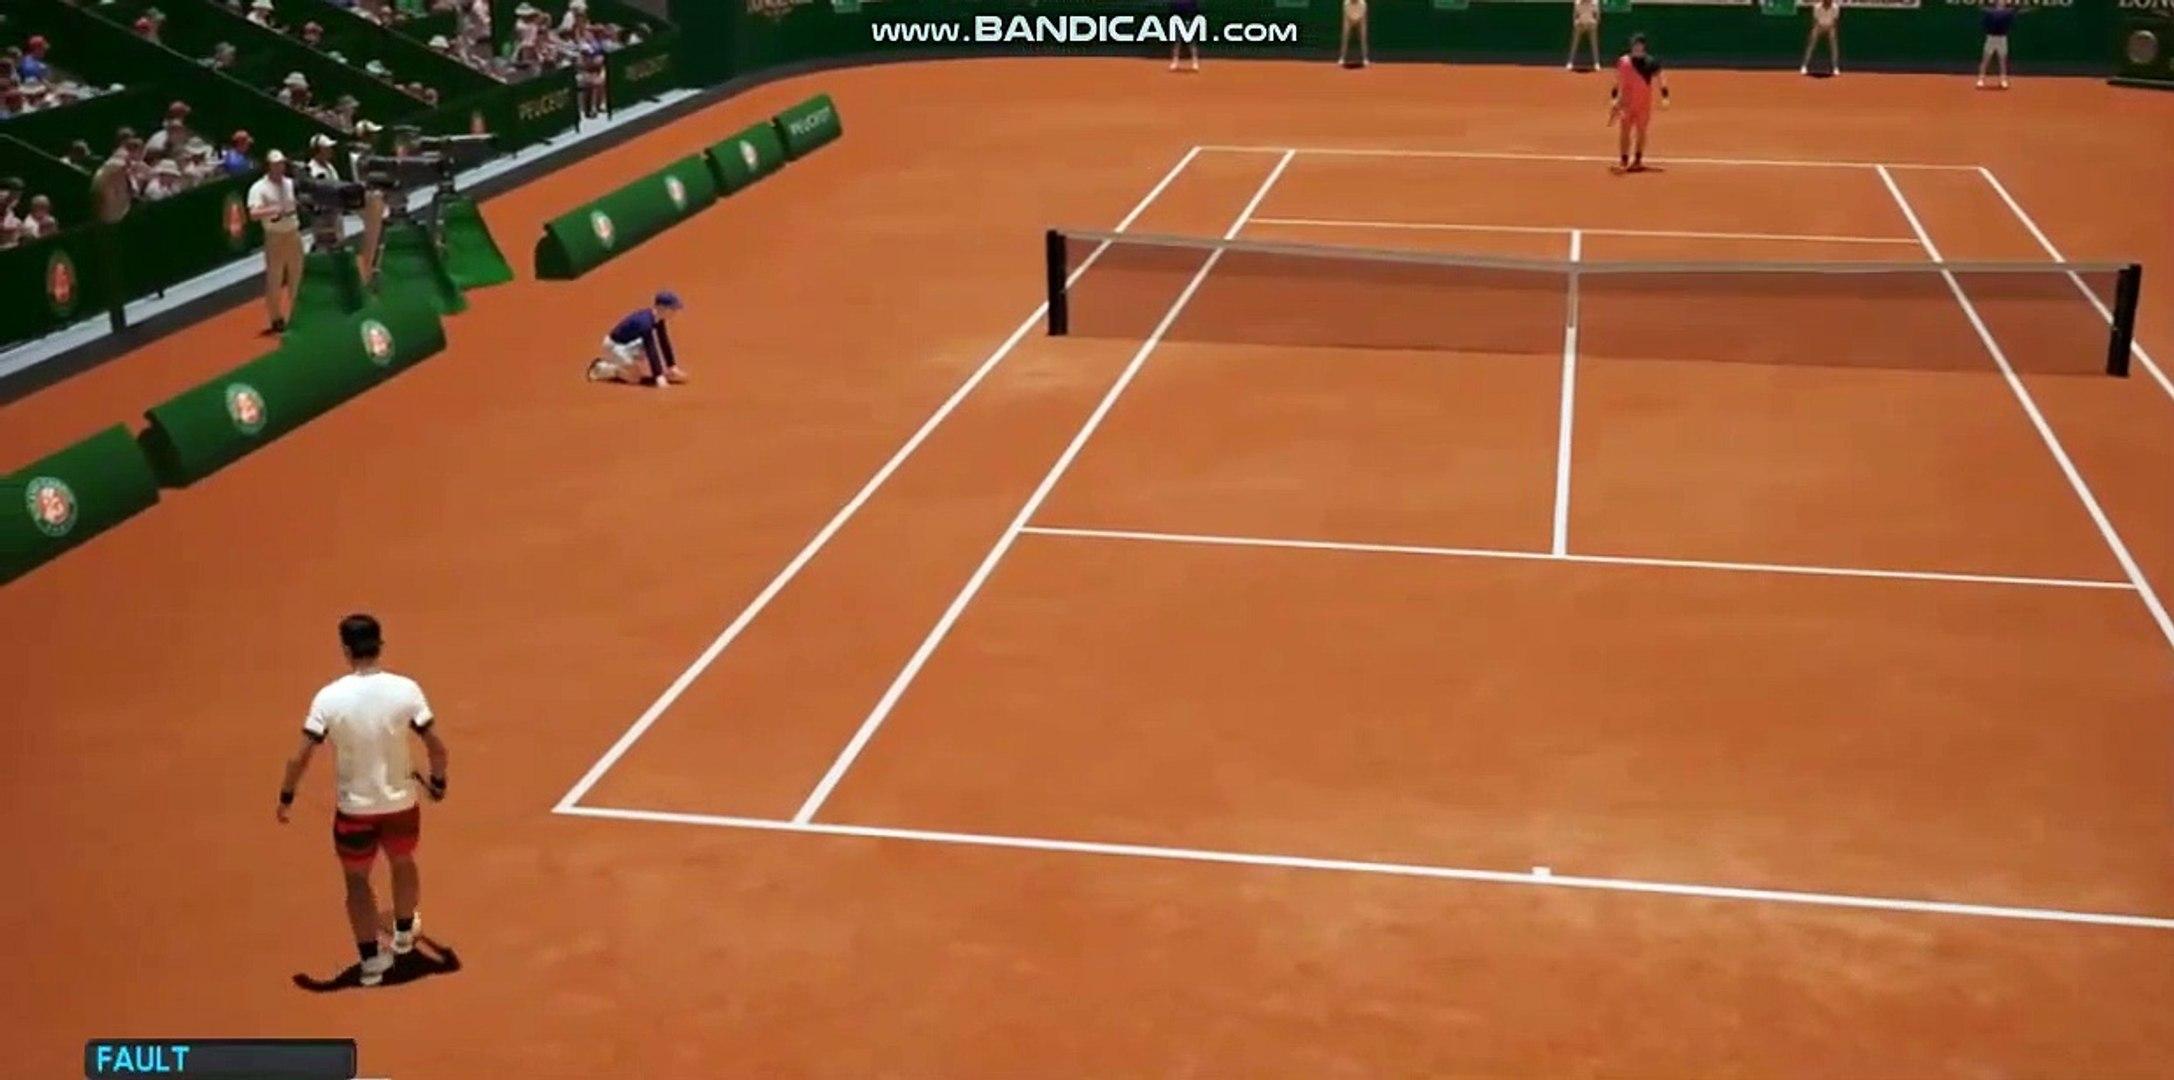 Andreozzi Guido vs Pella Guido Highlights  Roland Garros 2019 - The French Open